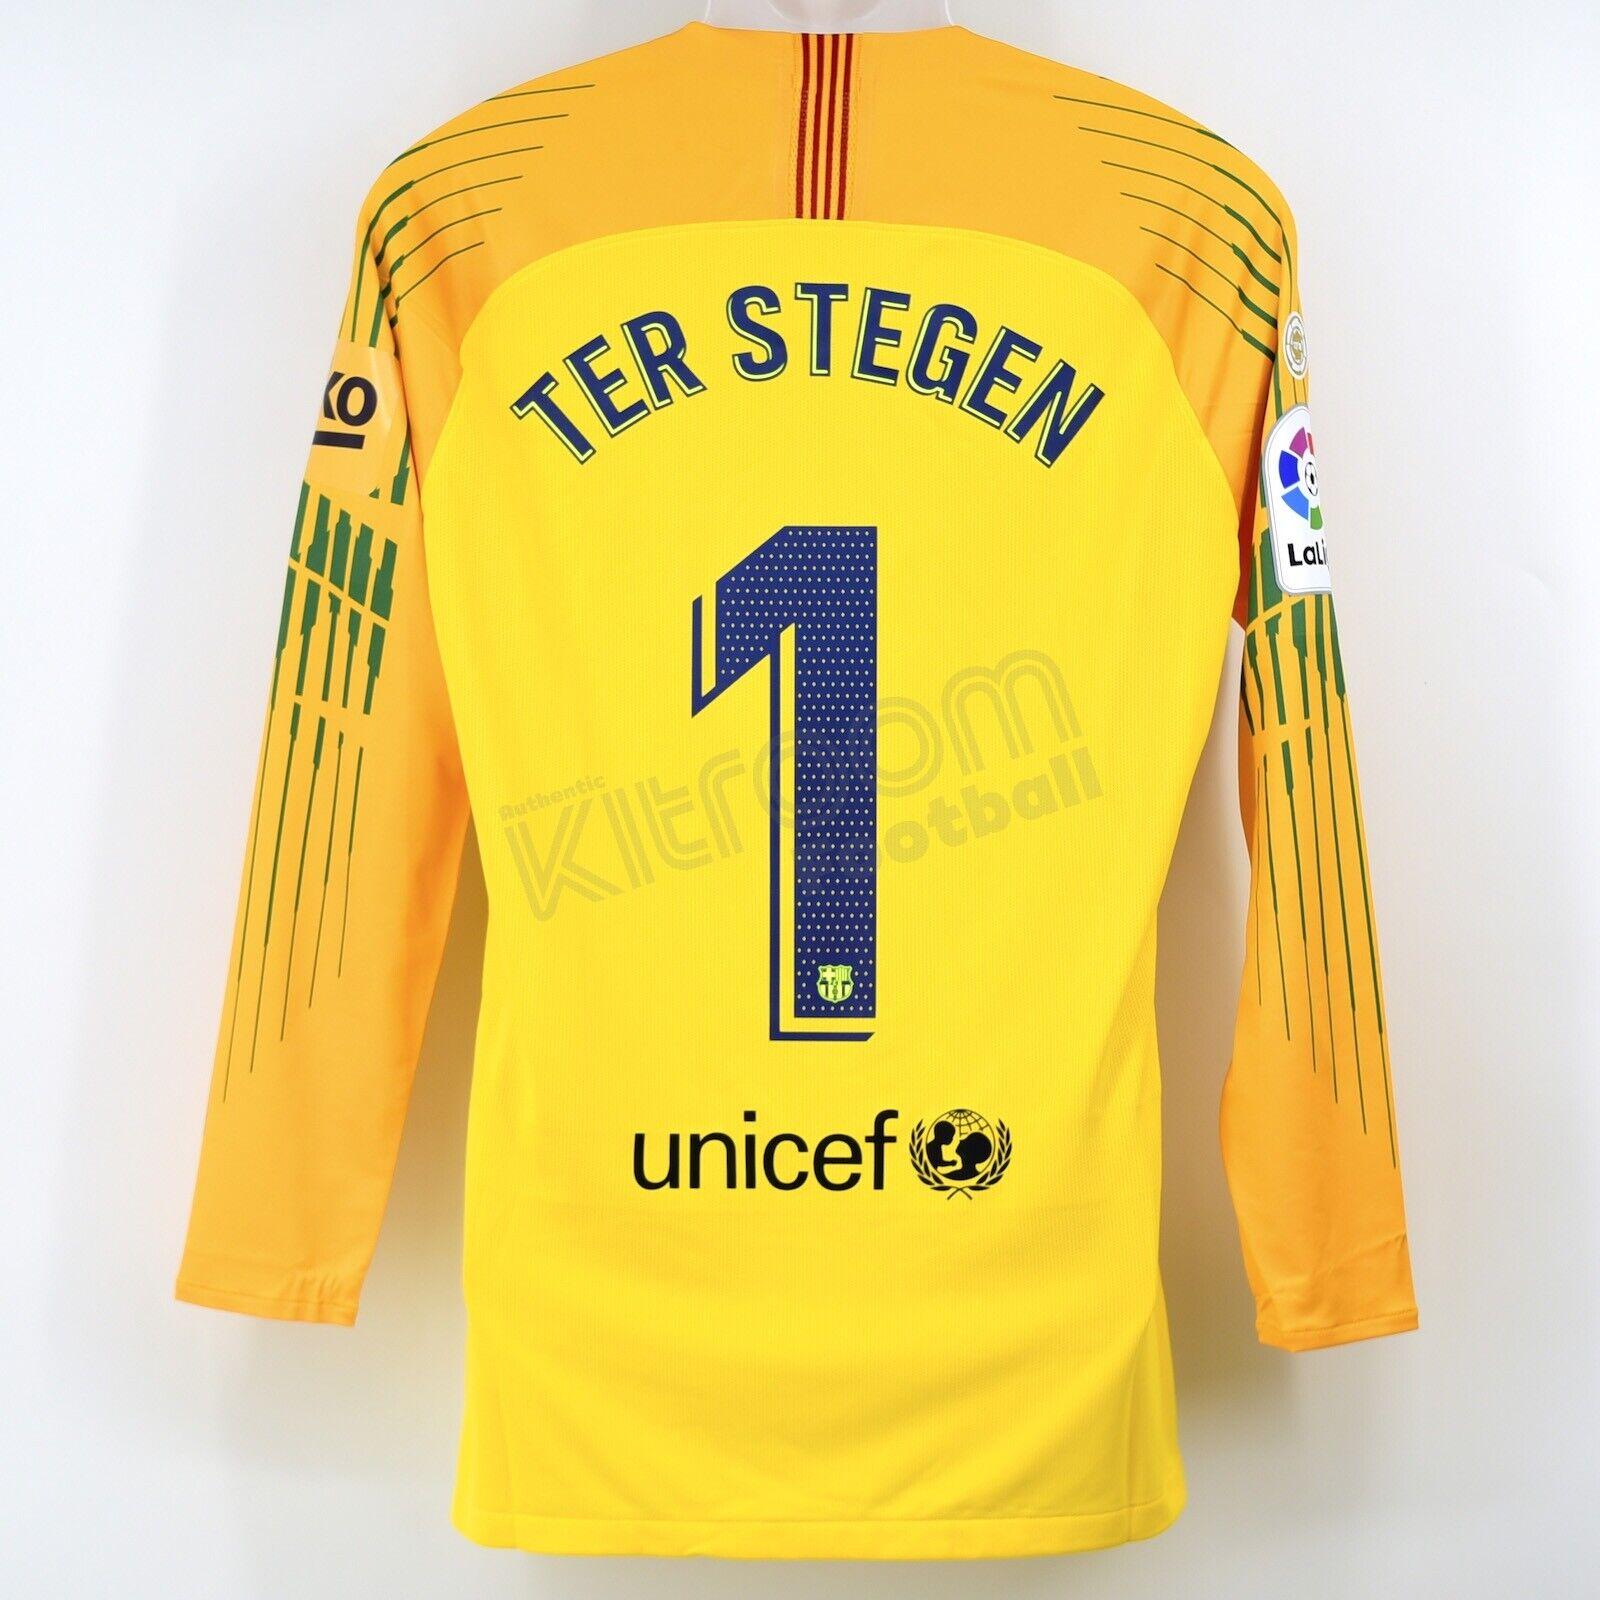 201819 Barcelona Player Issue giallo GK Shirt  1 Ter Stegen La Liga Match Un...